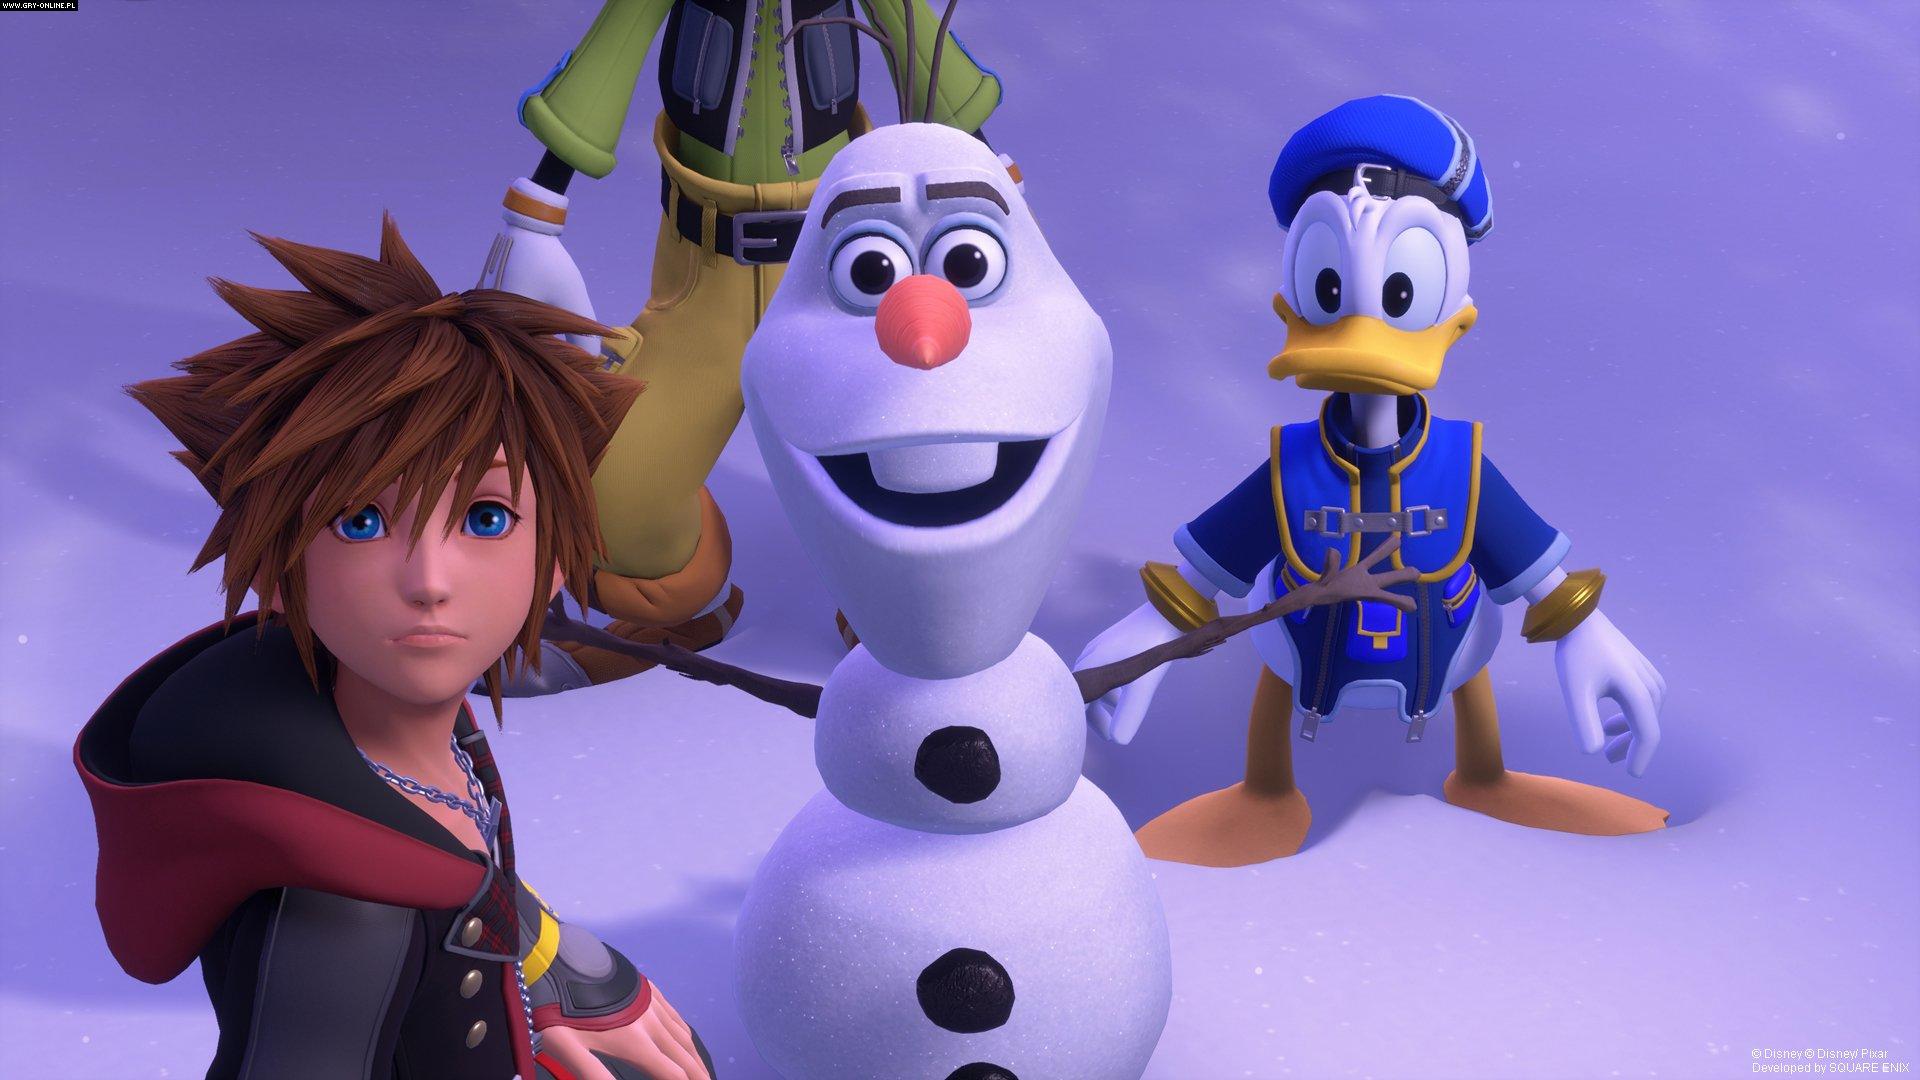 Kingdom Hearts III PS4, XONE Games Image 93/191, Square-Enix / Eidos